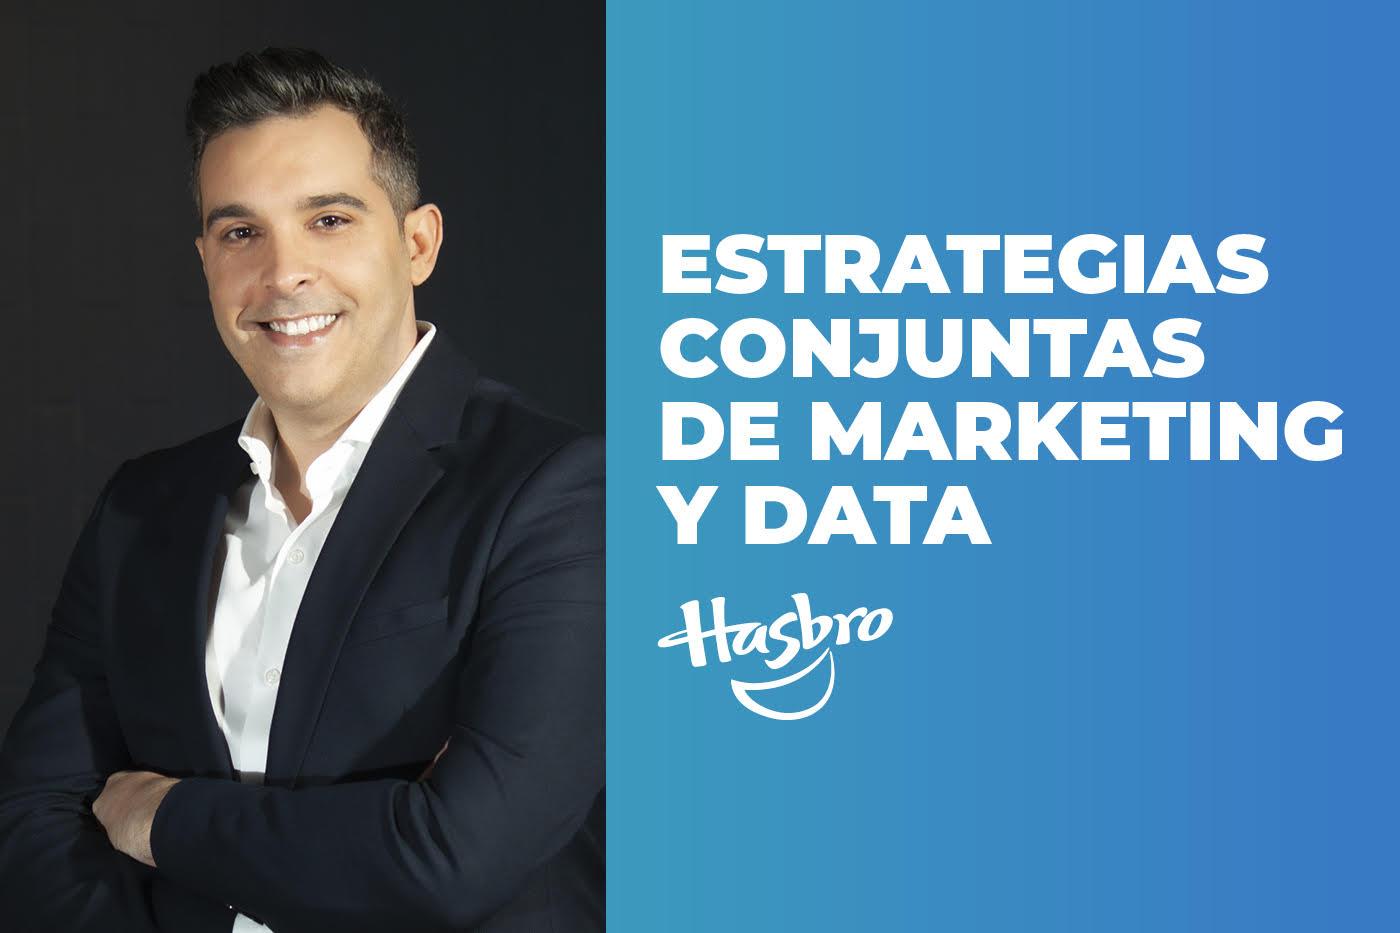 Data Driven Marketing, la estrategia de Hasbro junto a Infinia